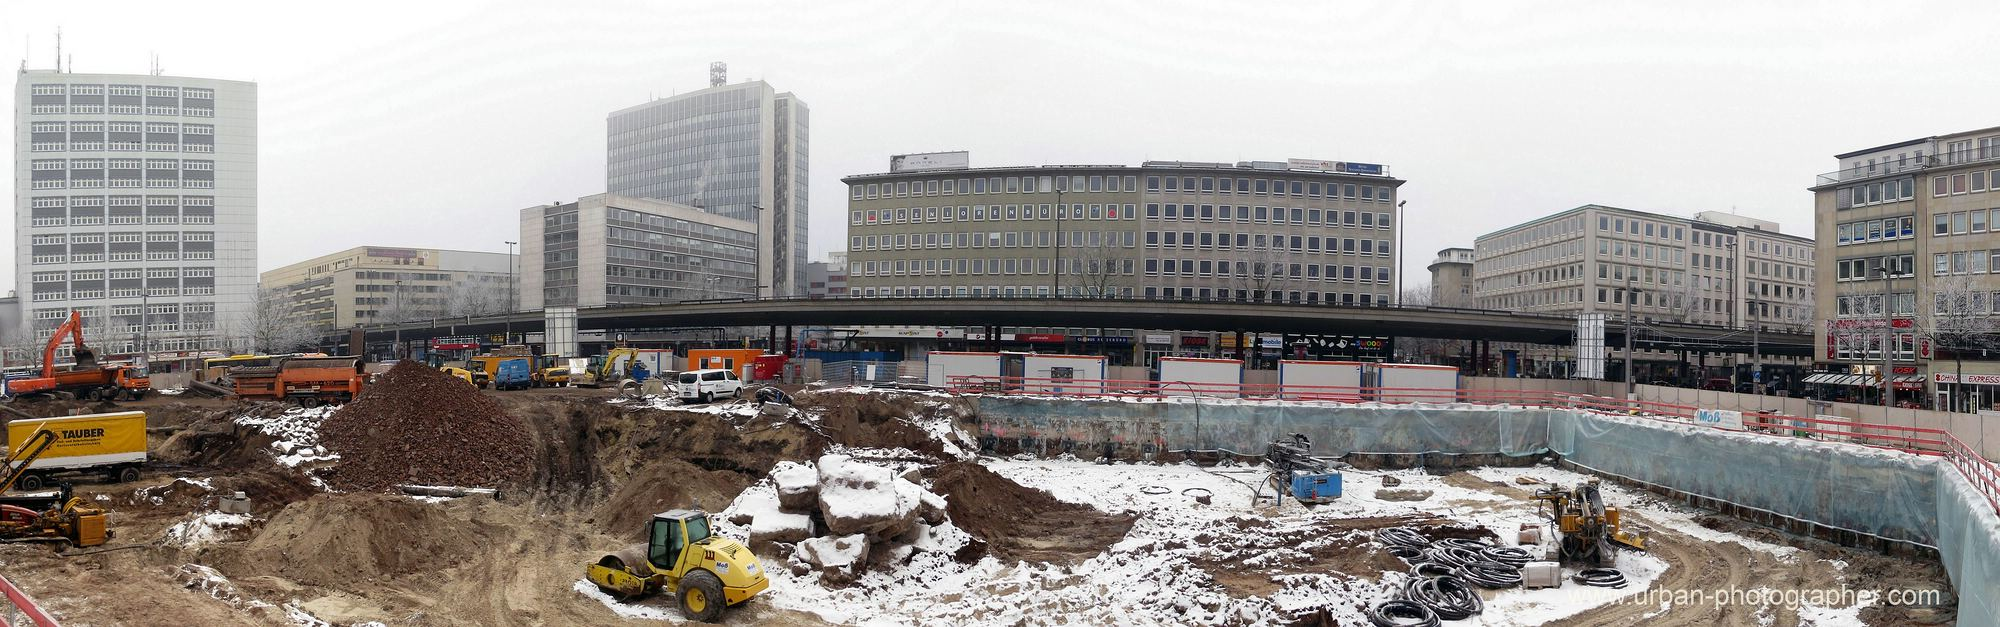 Baustelle Bahnhofsplatz 17